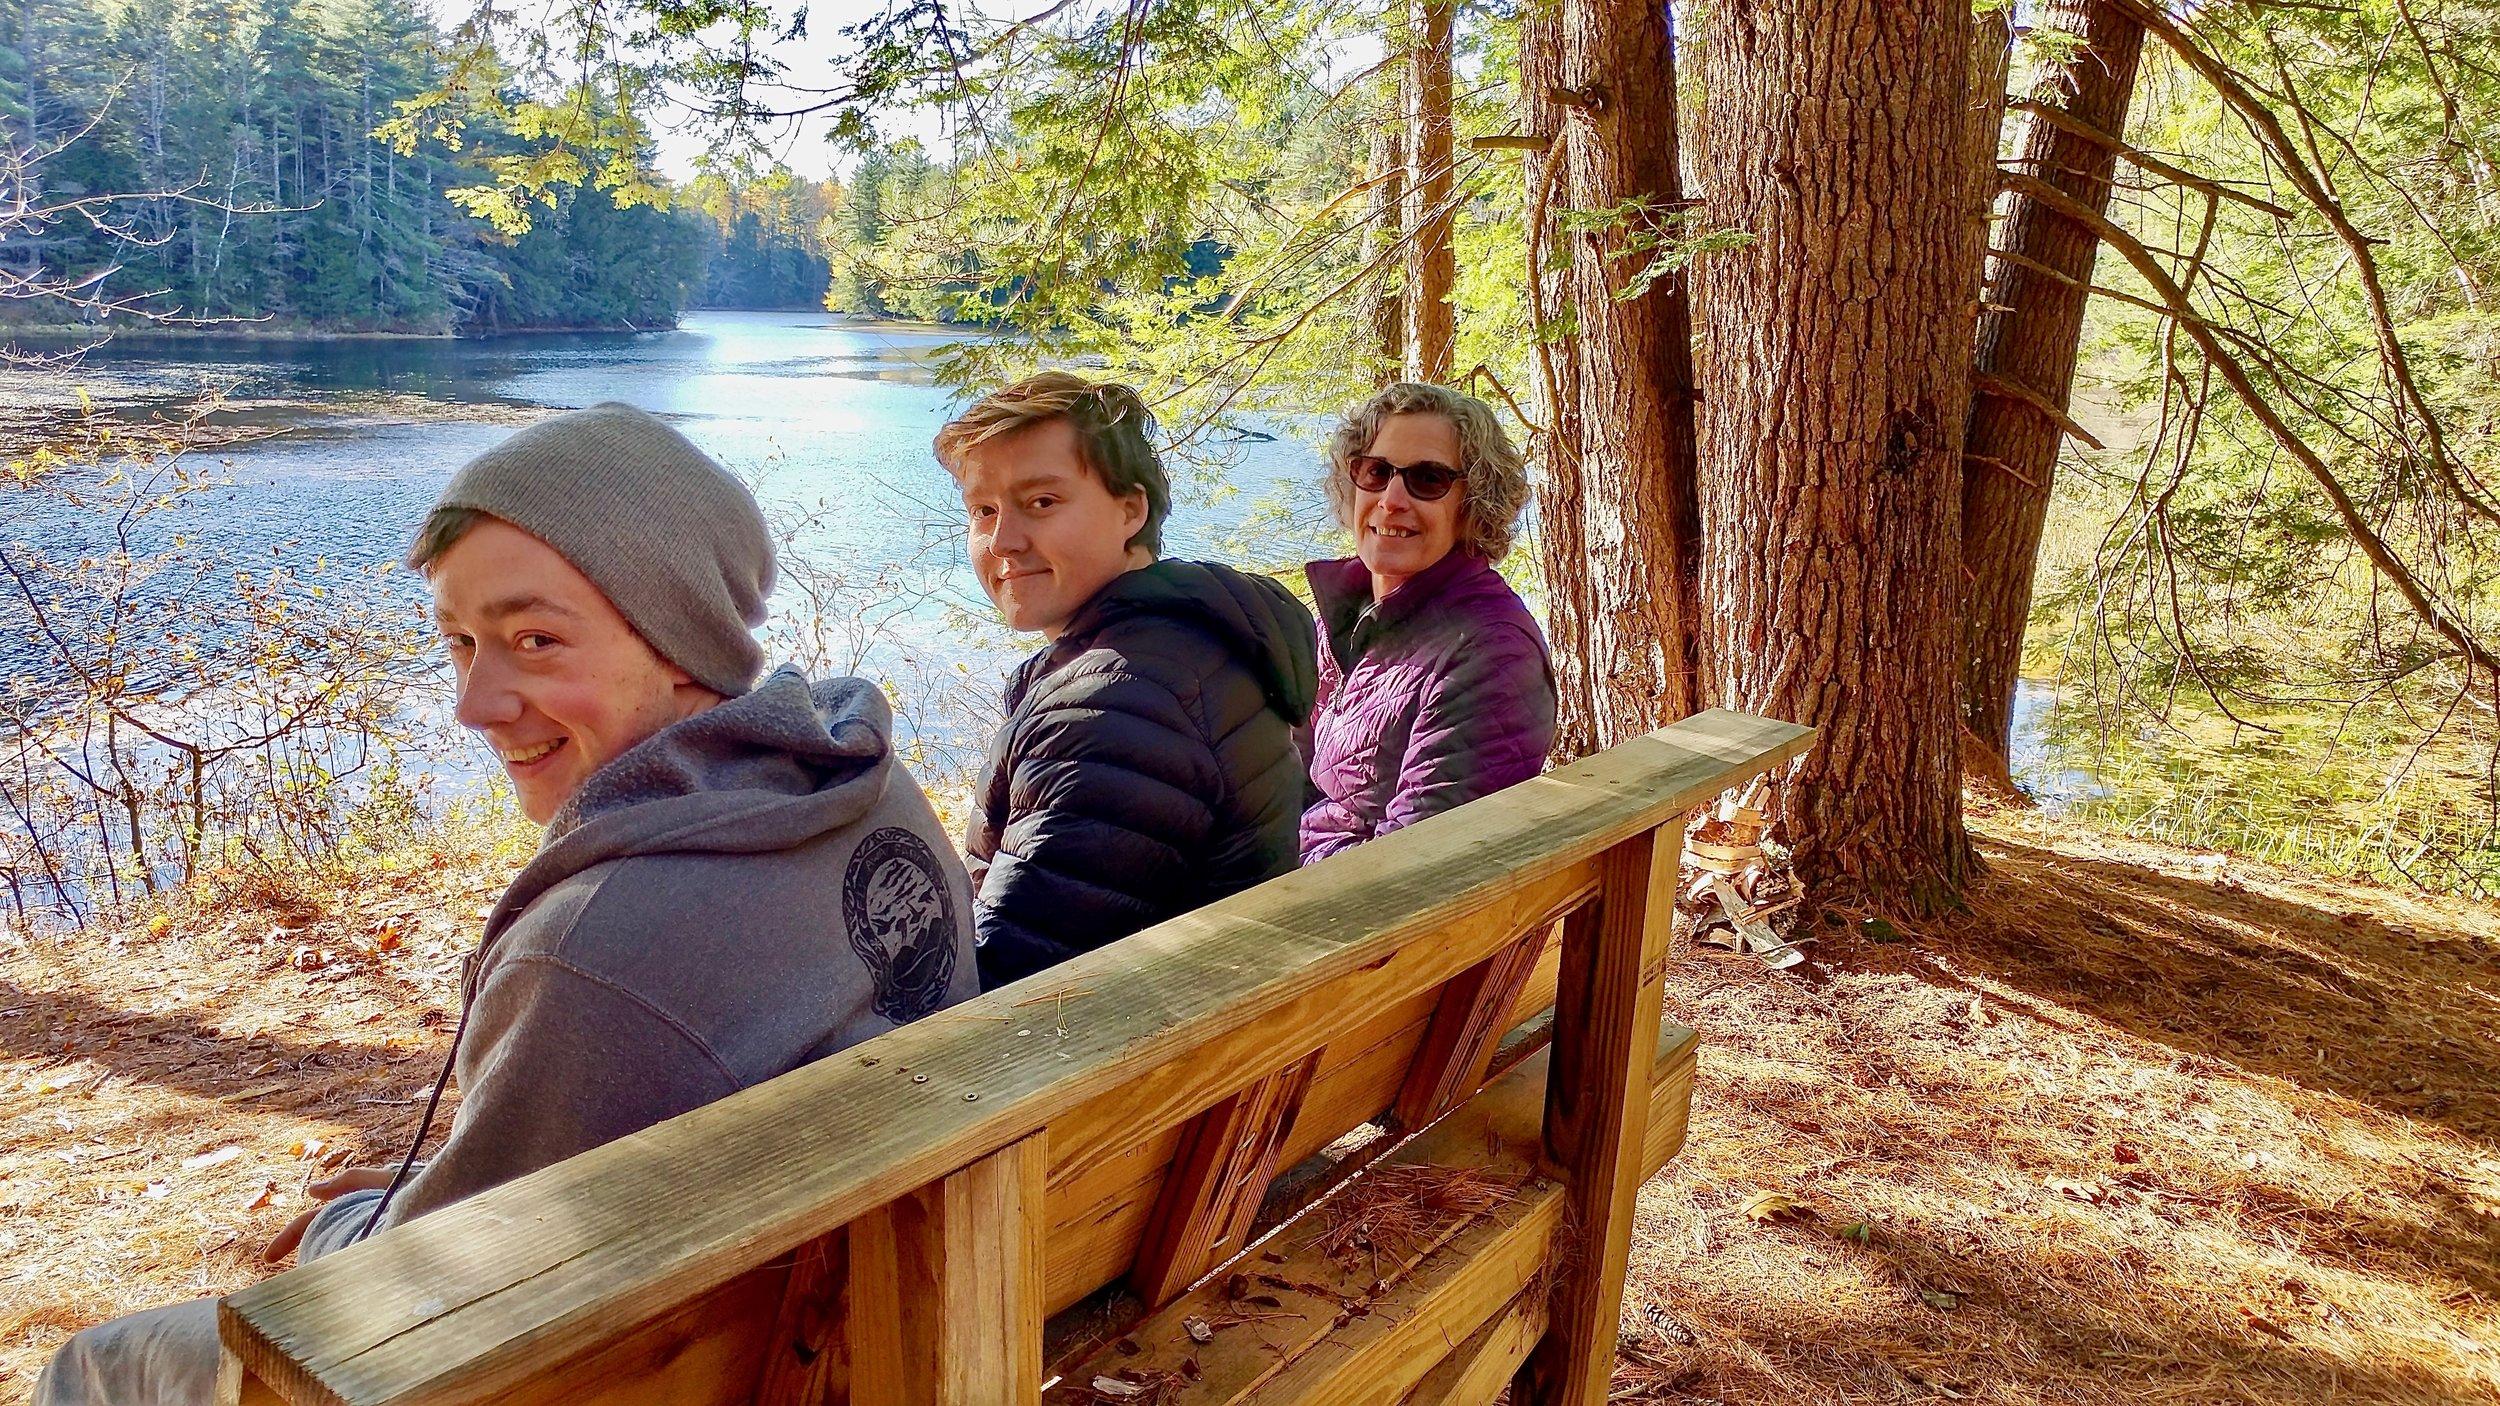 In order from left to right, Dakota Ward, Aidan Black, & Alice Bragg